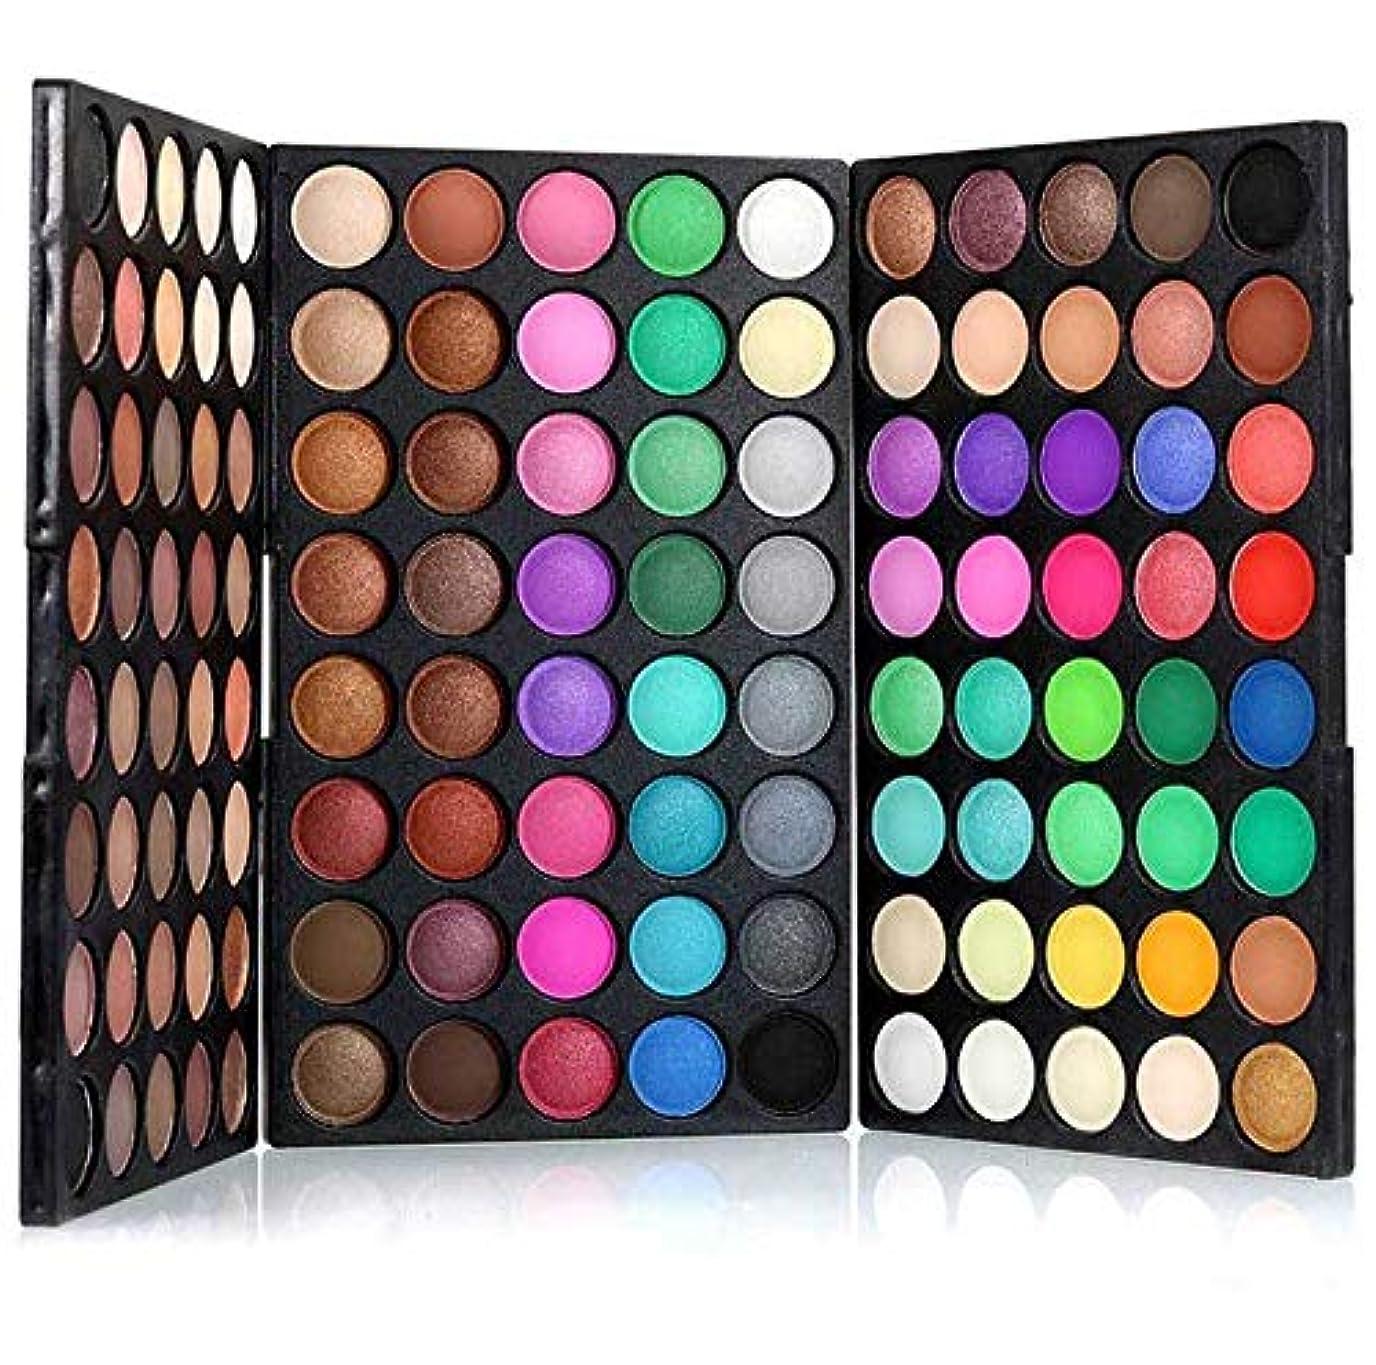 FidgetGear 120色化粧品アイシャドウメイクアップパレットアイシャドウマットシマーミラー